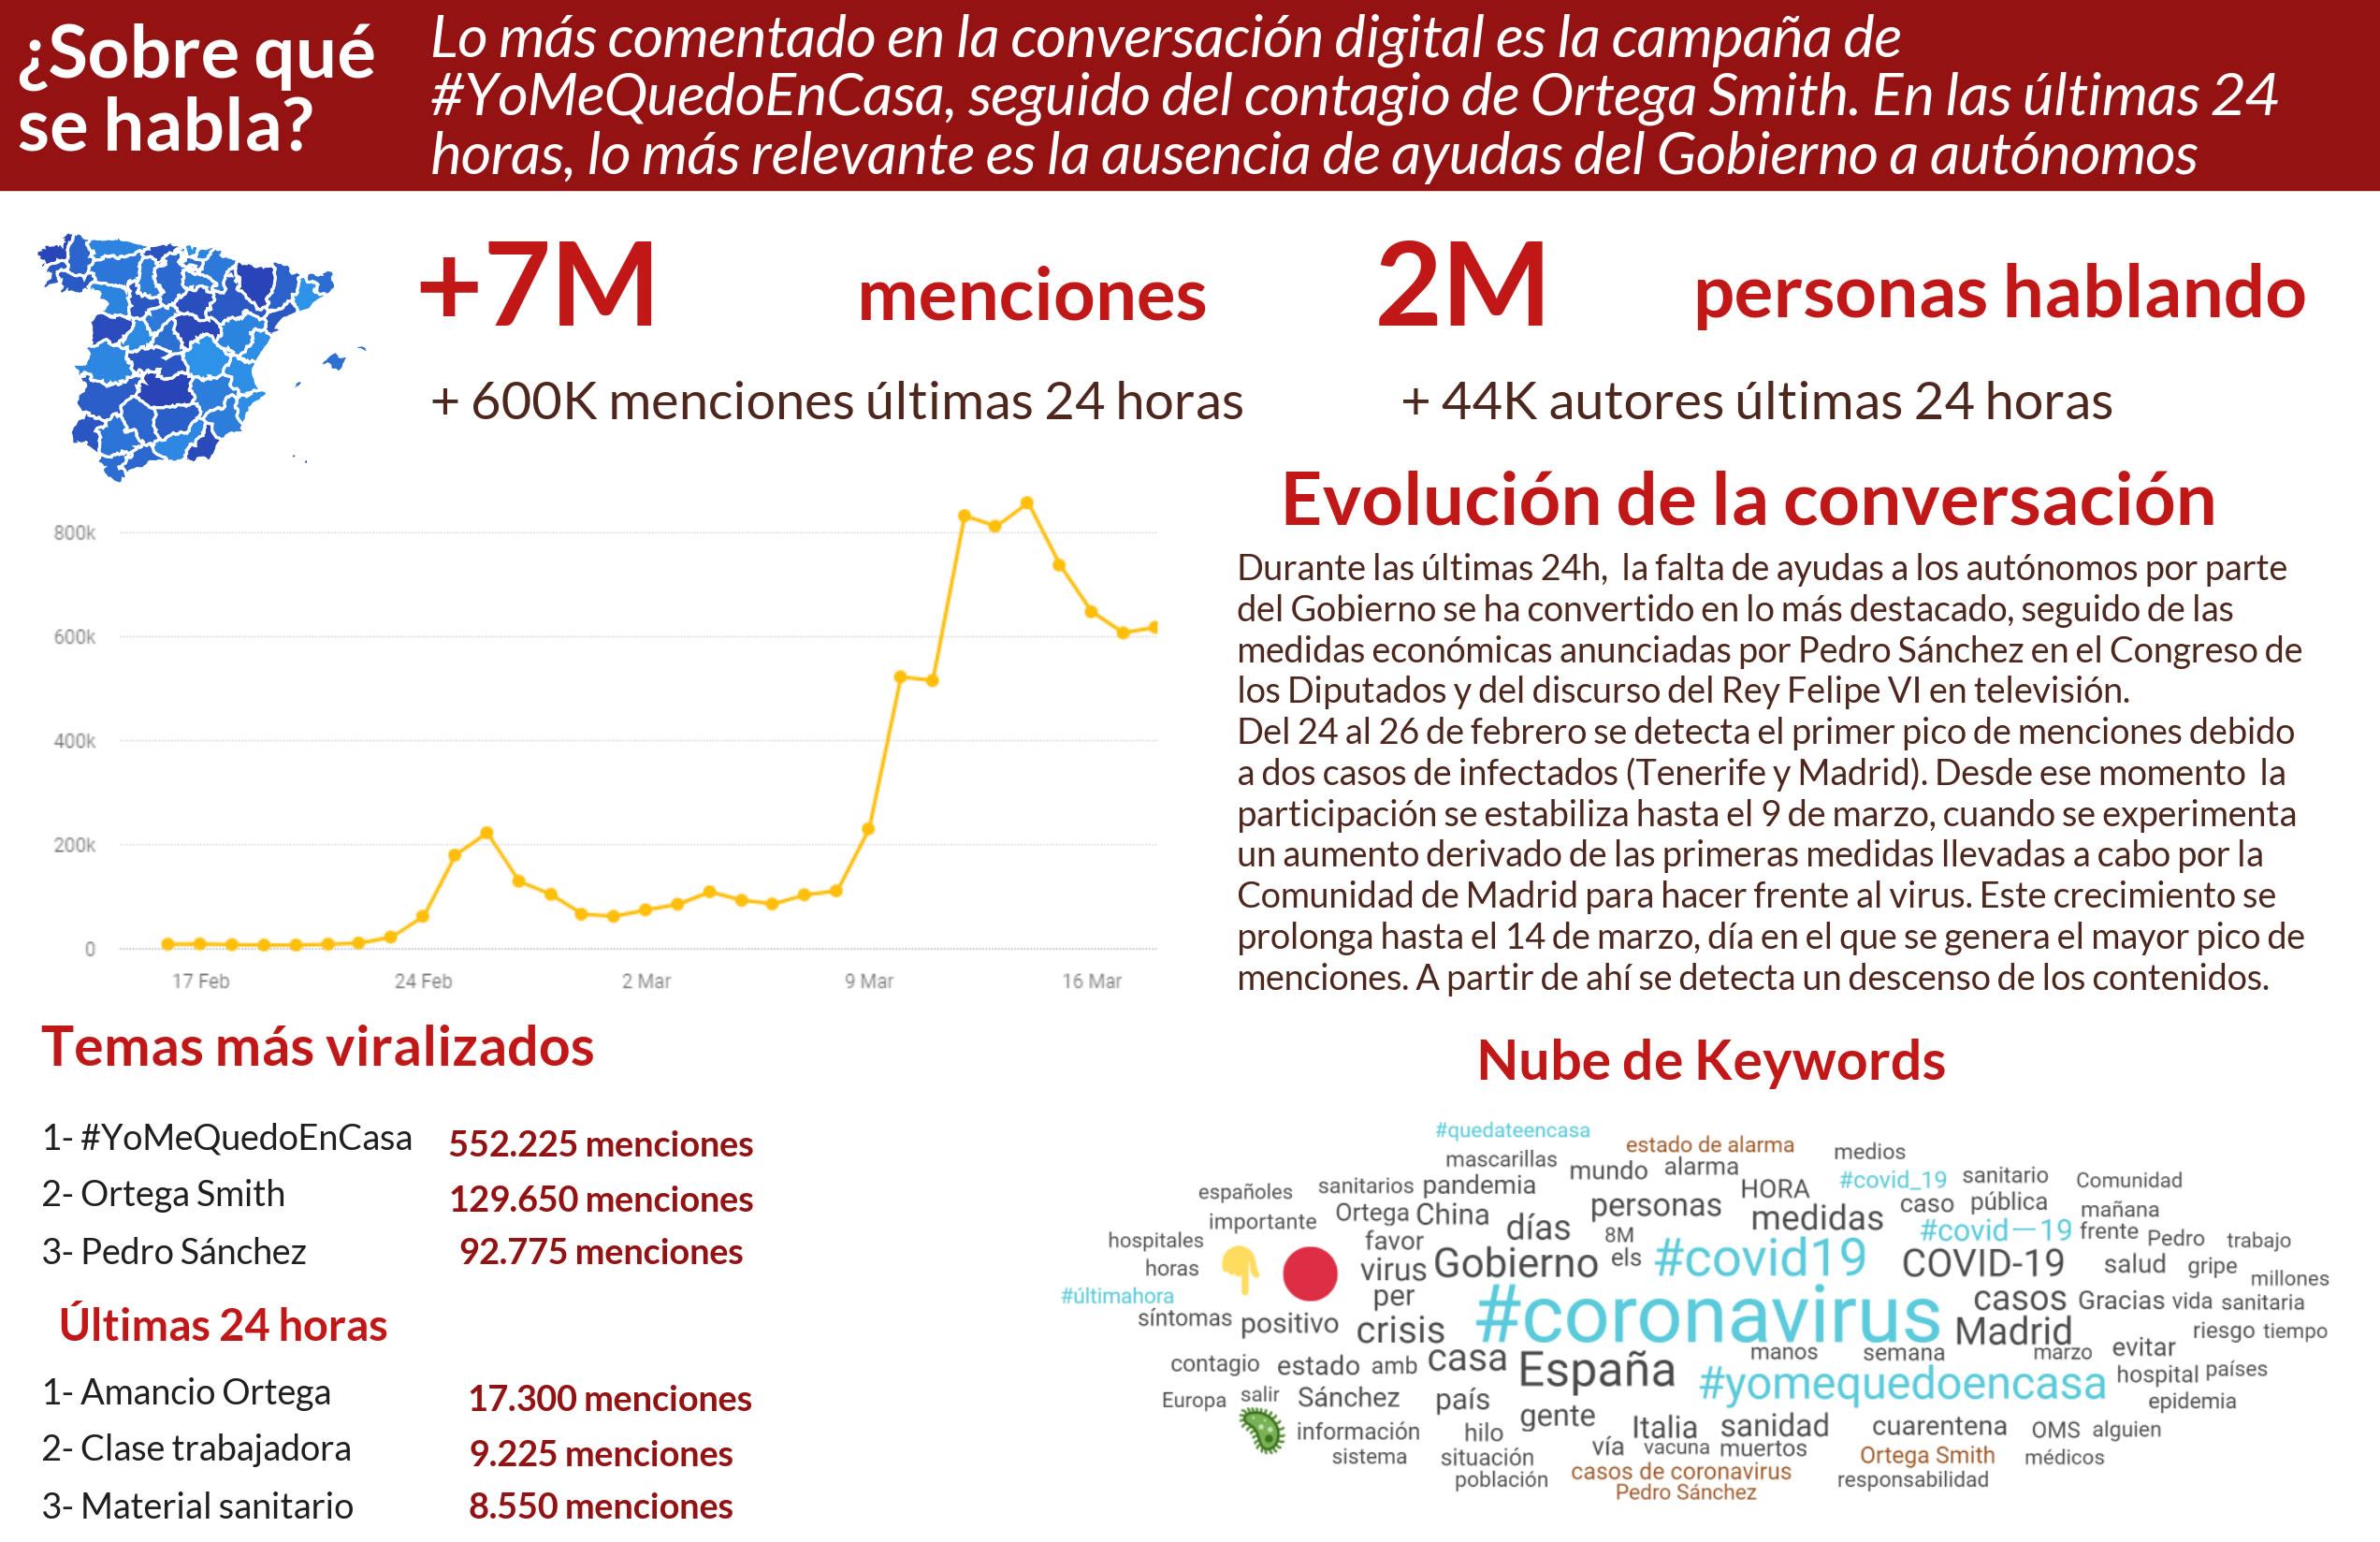 coronavirus en Twitter